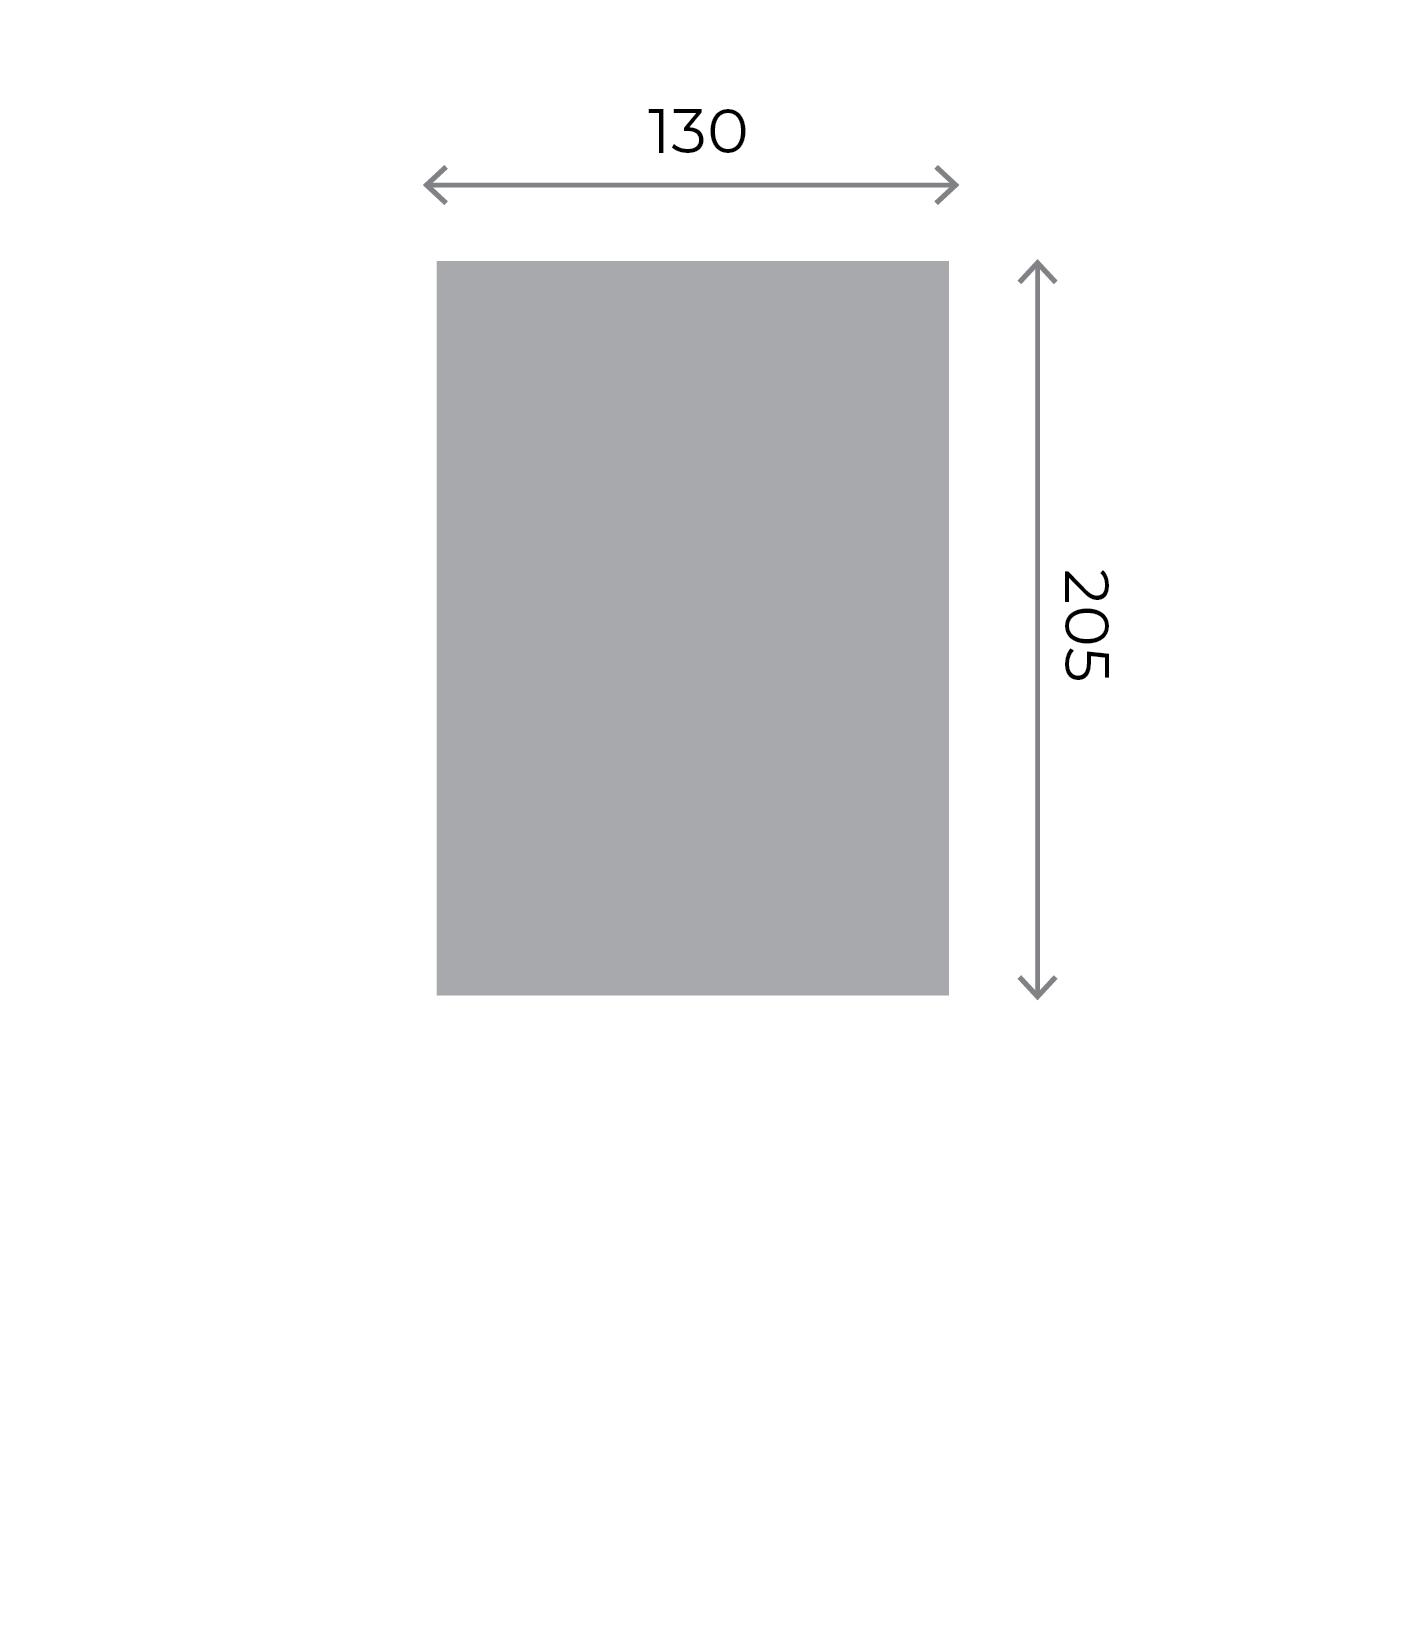 Any Shape Stickers - Small Kiss-cut Sheet (130x205mm) 130x205mm 01 Image